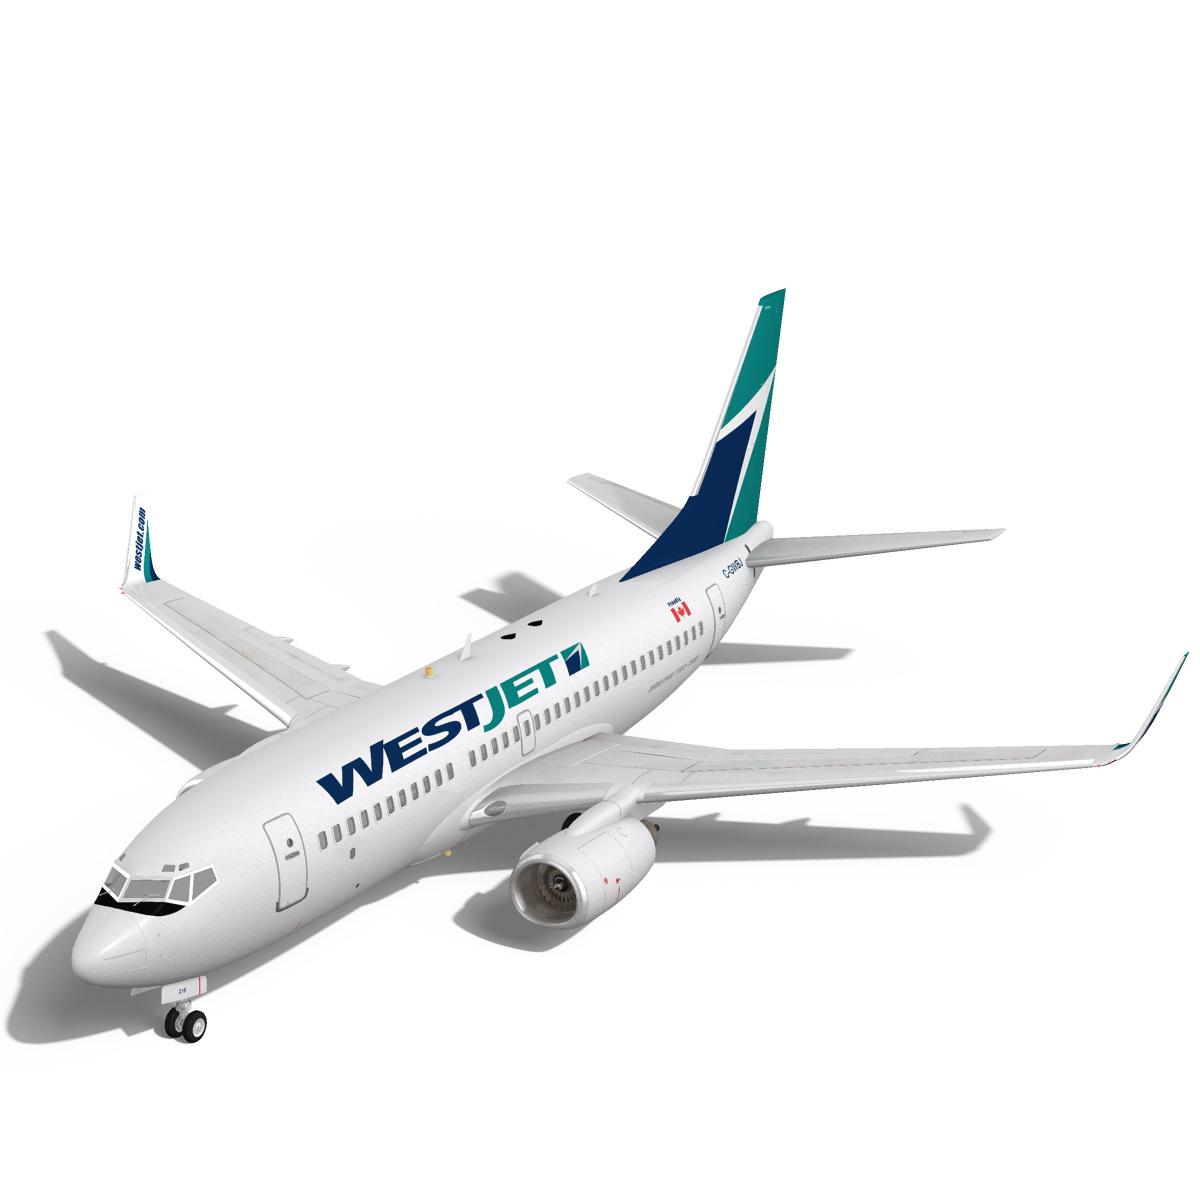 westjet boeing 737-700w 3d model max fbx c4d ma mb obj